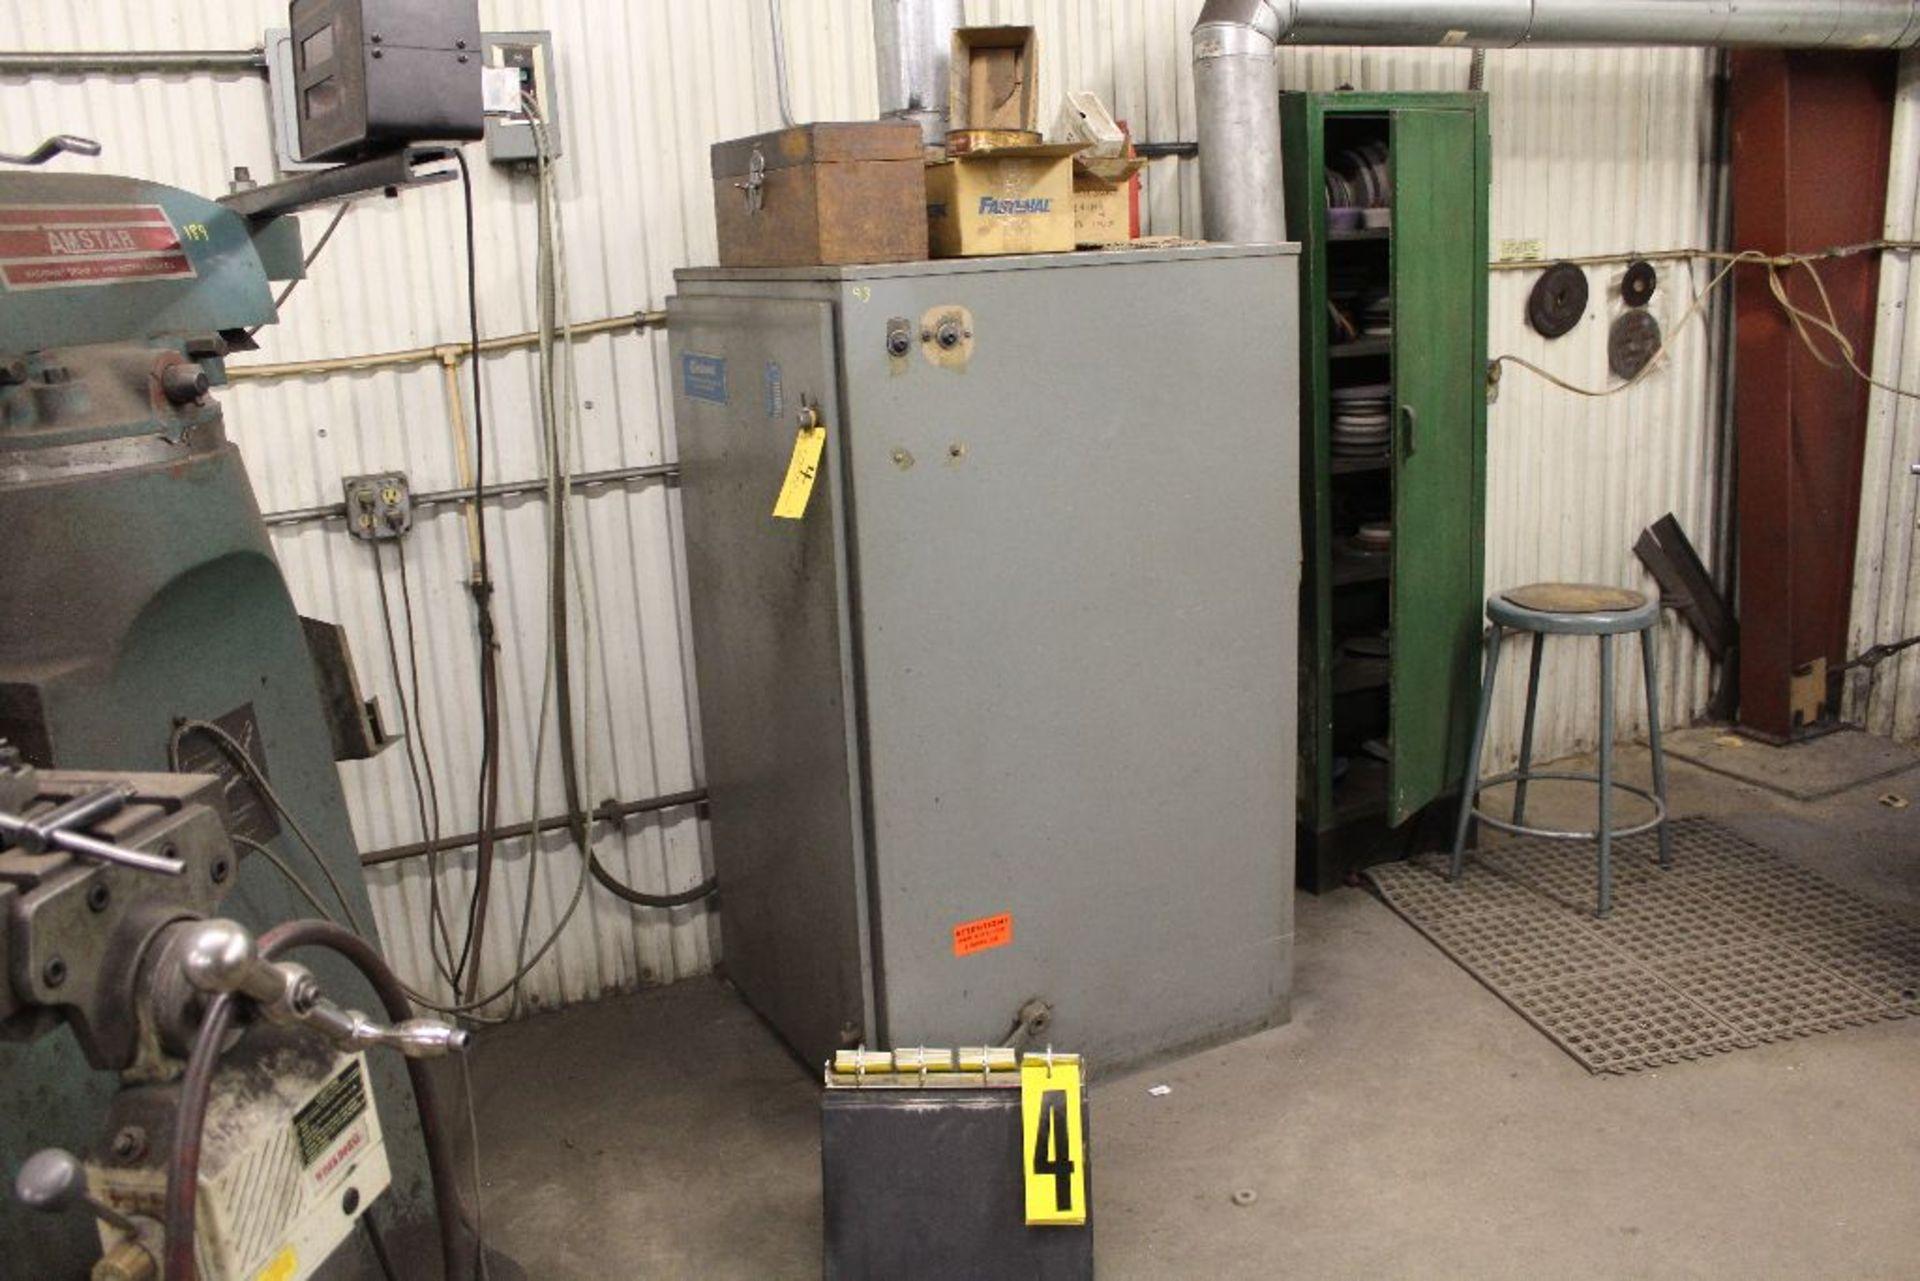 Lot 004 - Cincinnati filter system, model 101, 3 phase.